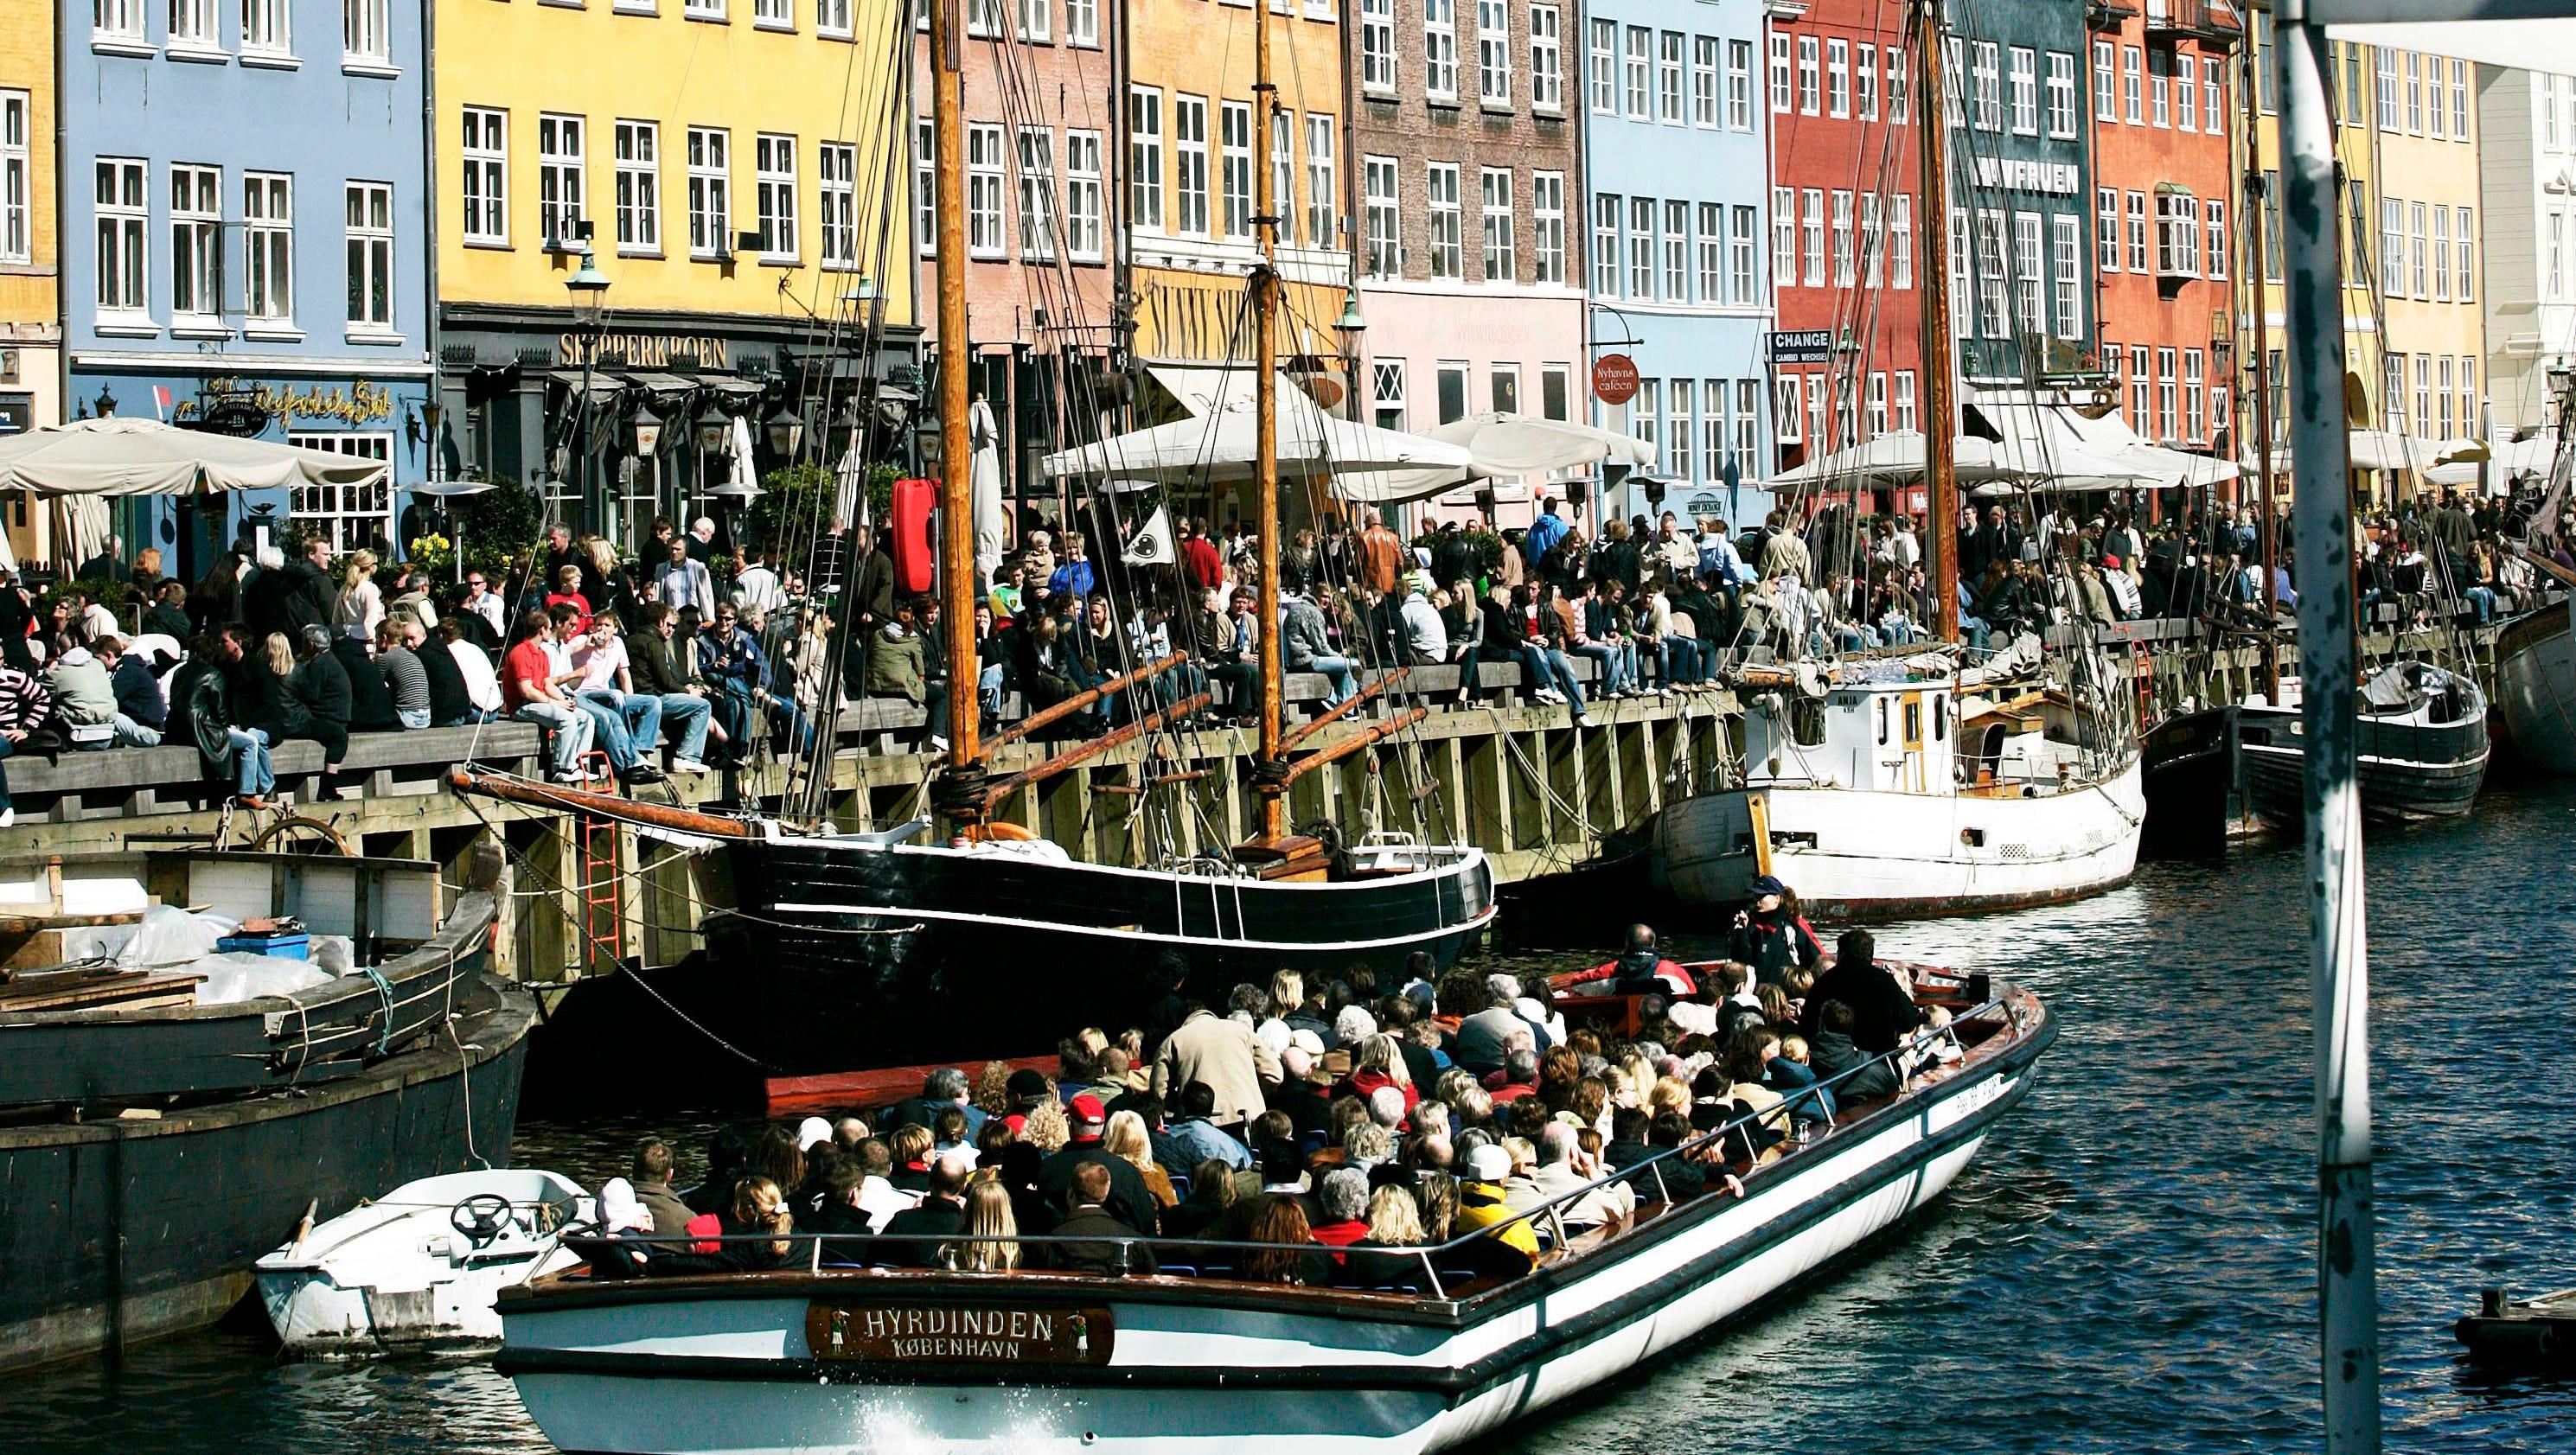 1683 in Denmark